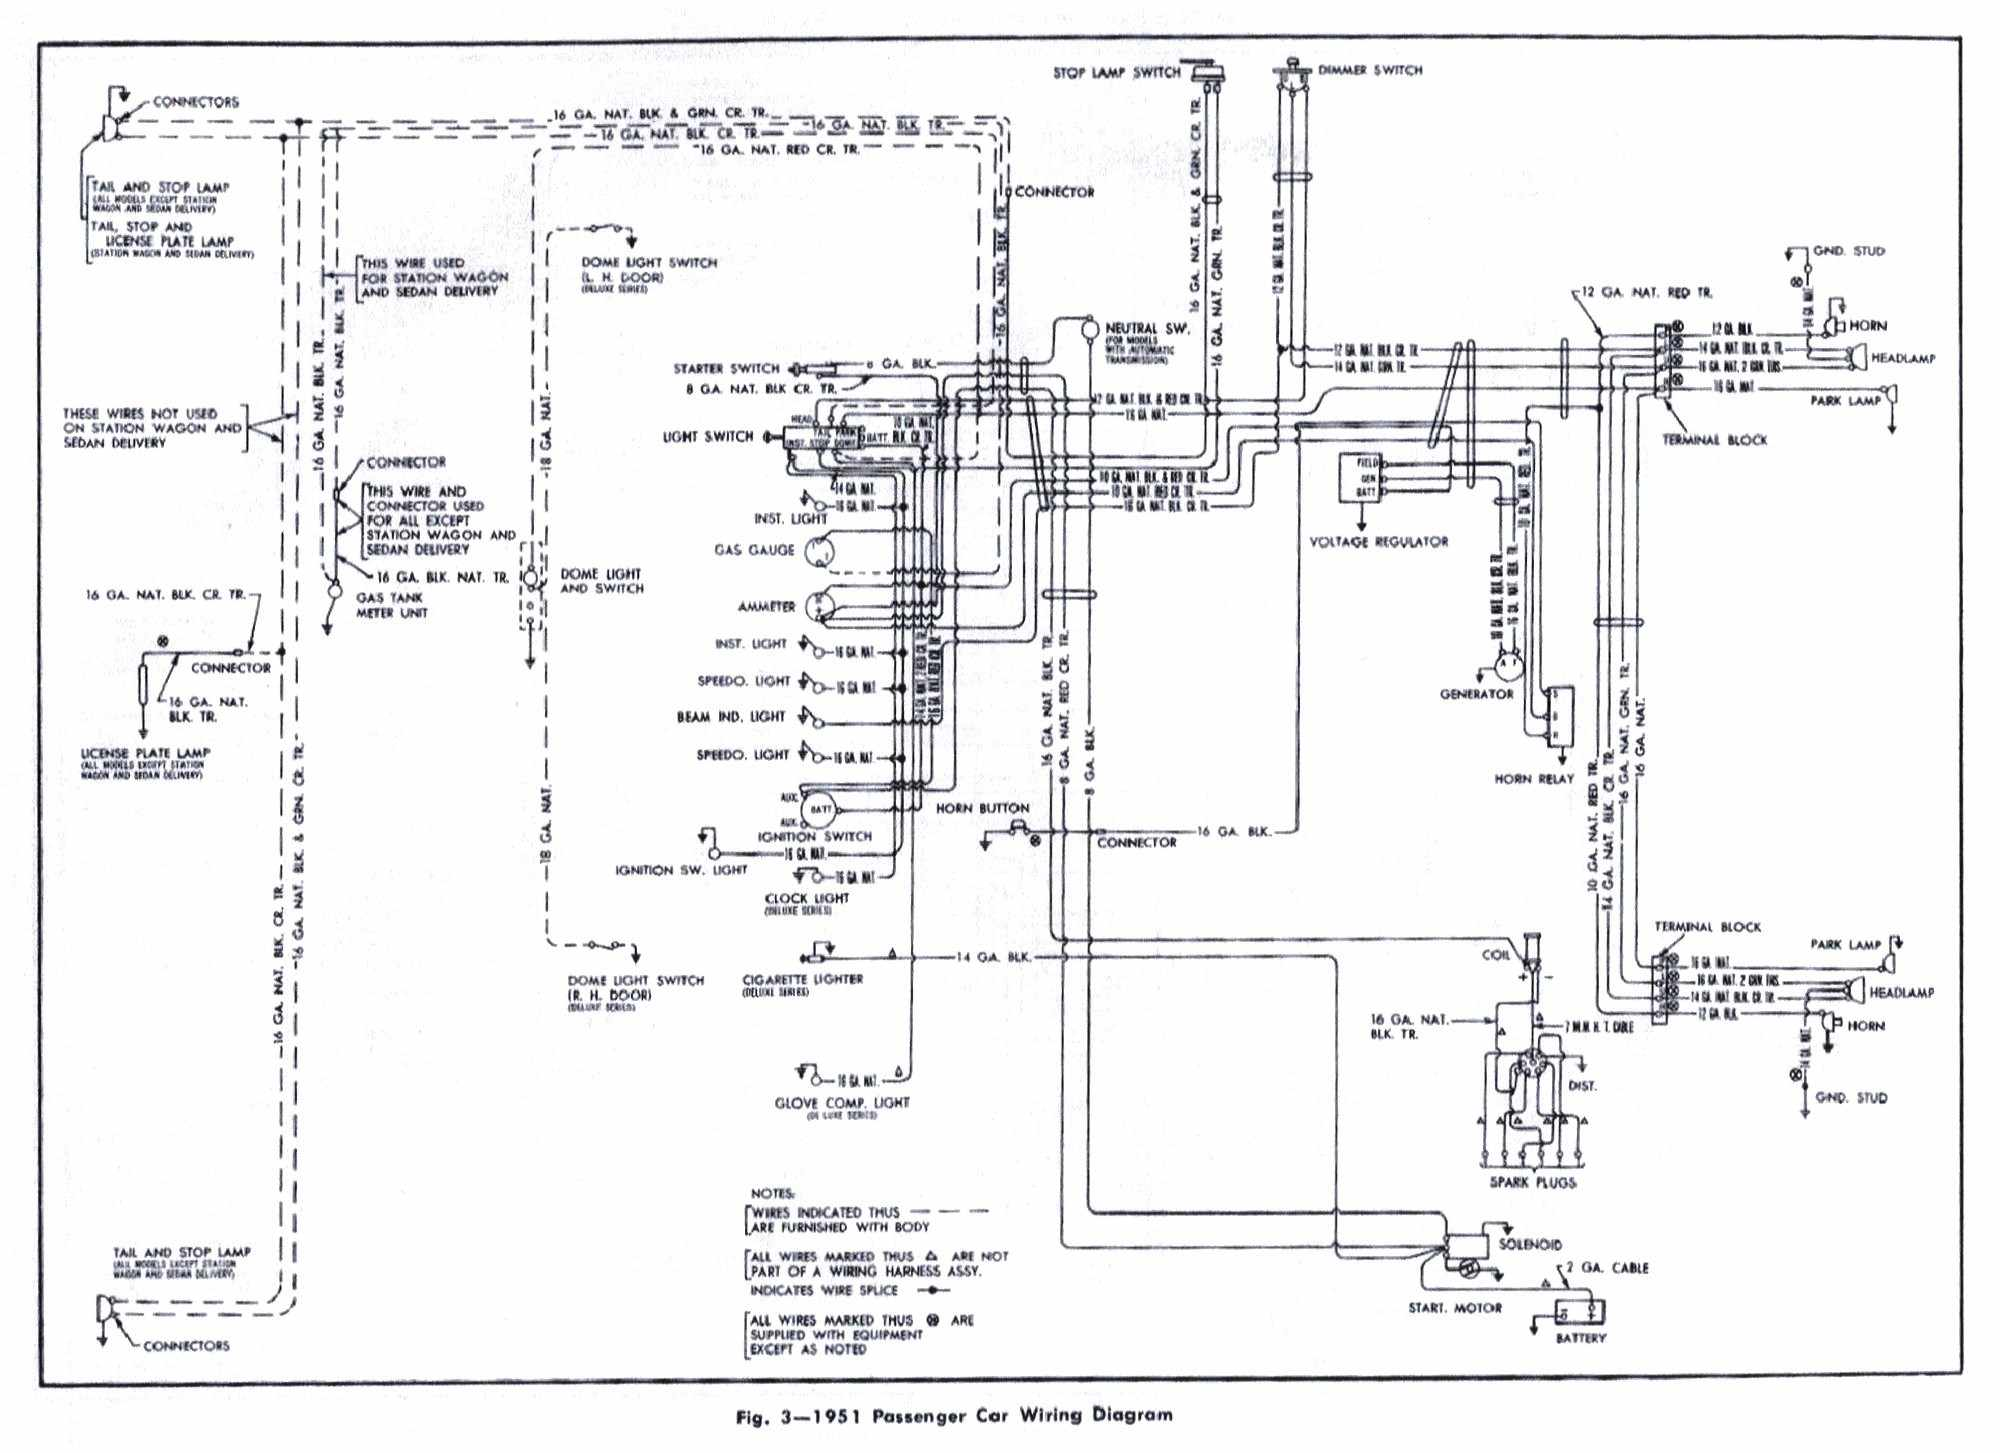 Hvac Wiring Diagram For 1995 Caprice Trusted Schematics 1991 Chevy S10 1995s 10 Schematic Diagrams Camaro